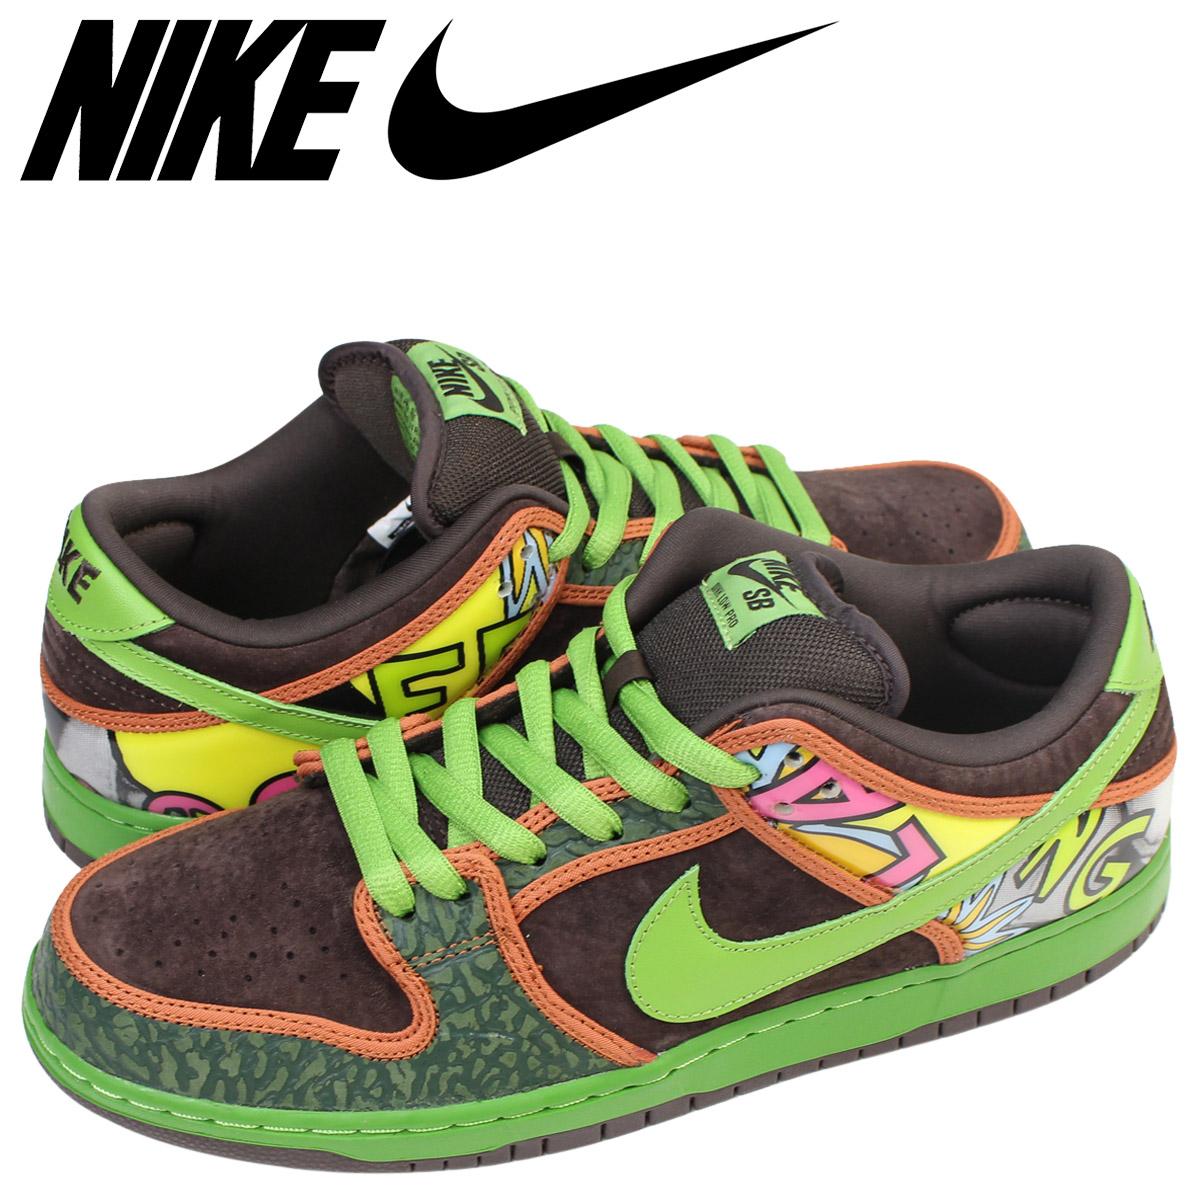 pretty nice 1c00e c0ae0 NIKE Nike SB dunk low sneakers DUNK LOW PREMIUM men 789,841-332 shoes green